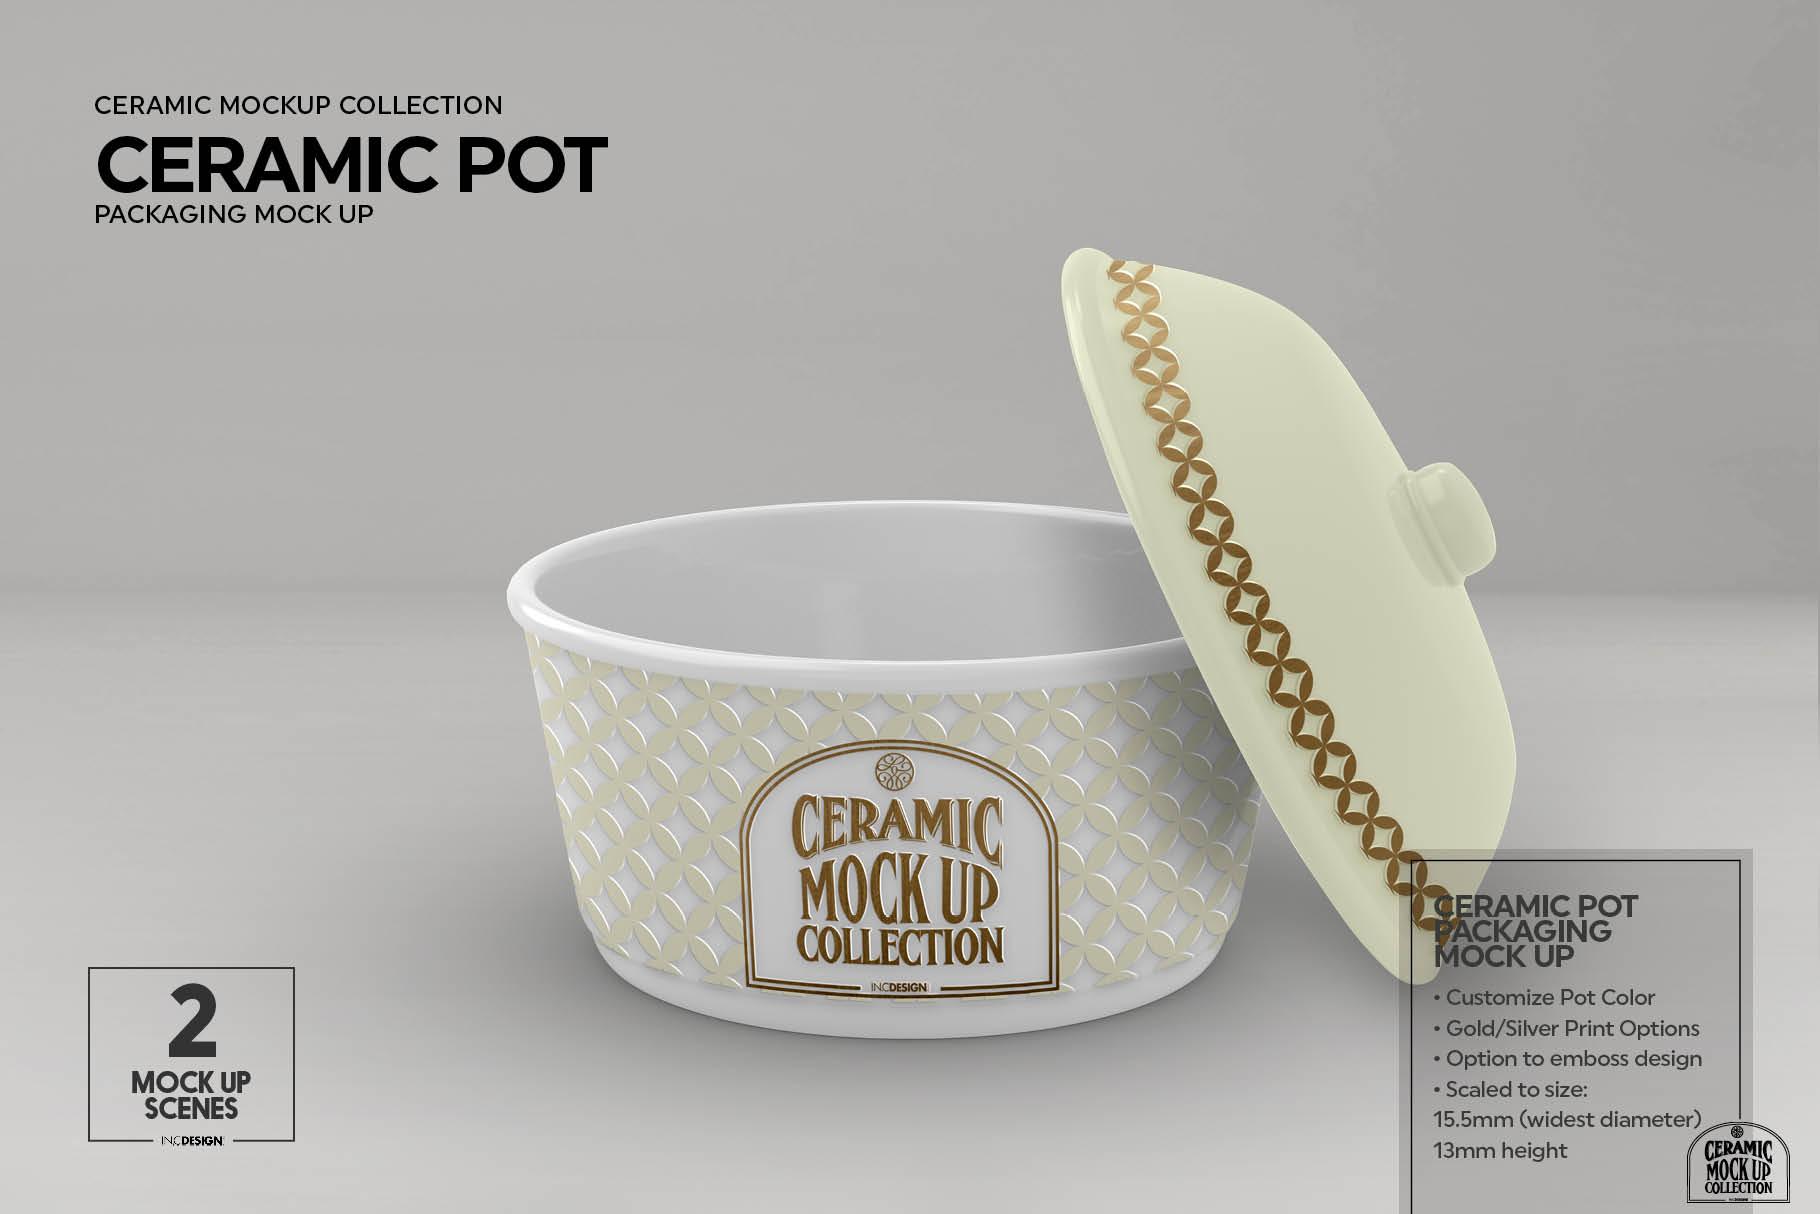 Ceramic Pot Packaging Mock Up example image 7